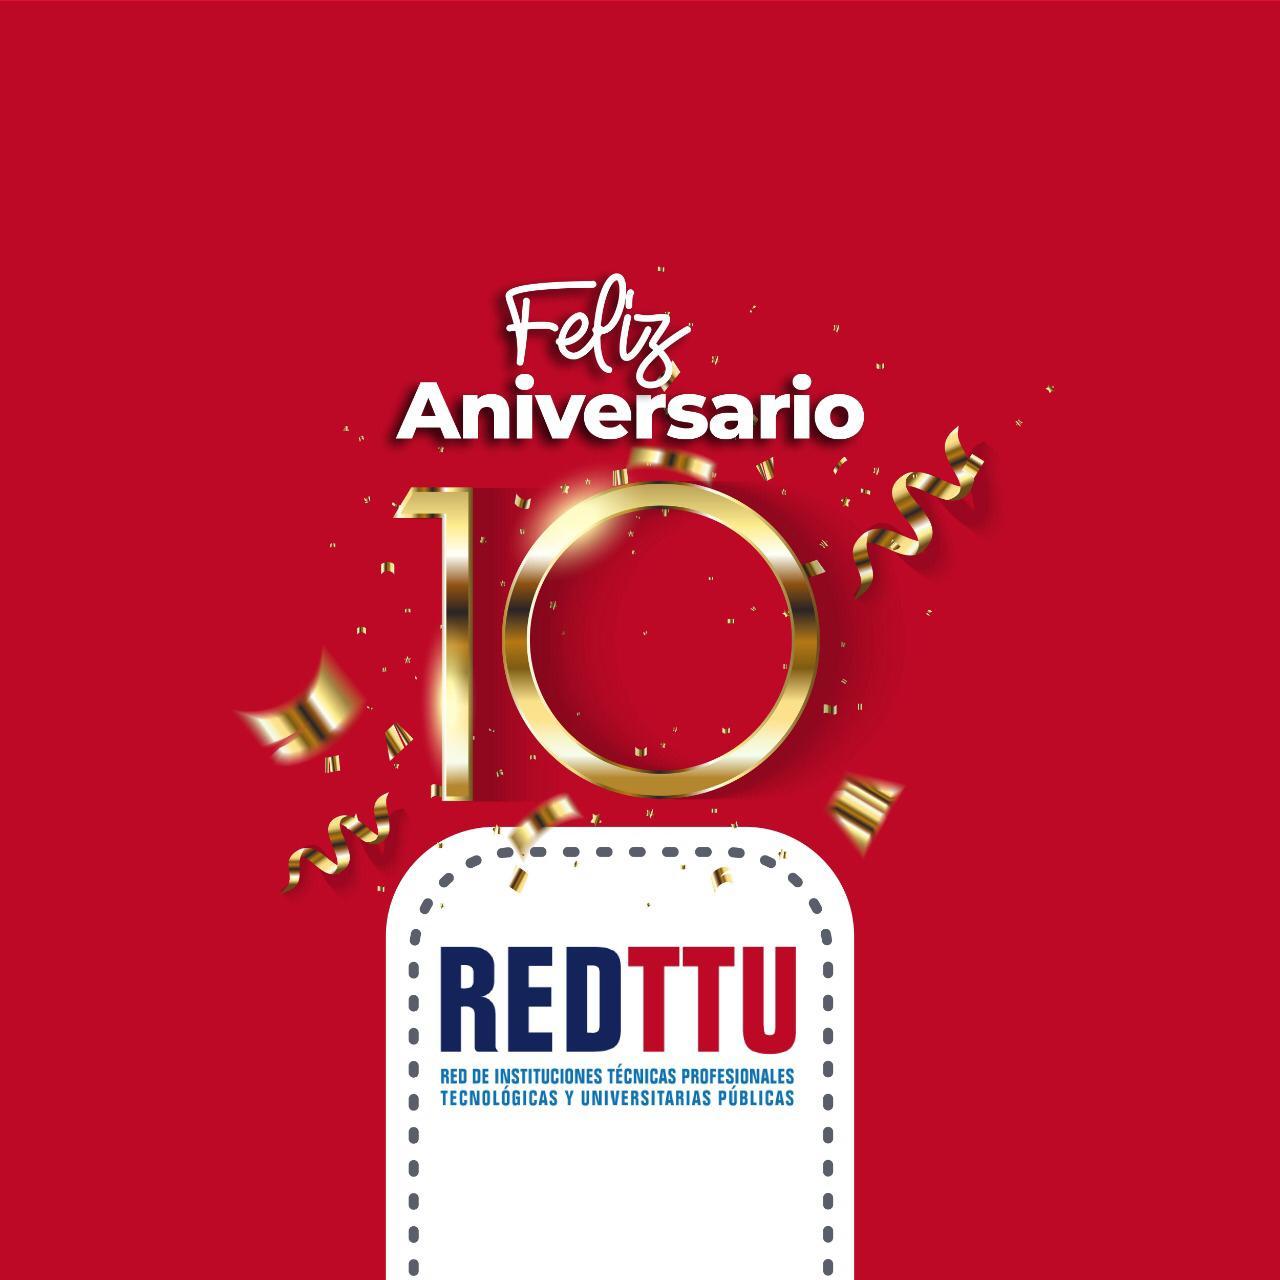 Décimo aniversario REDTTU